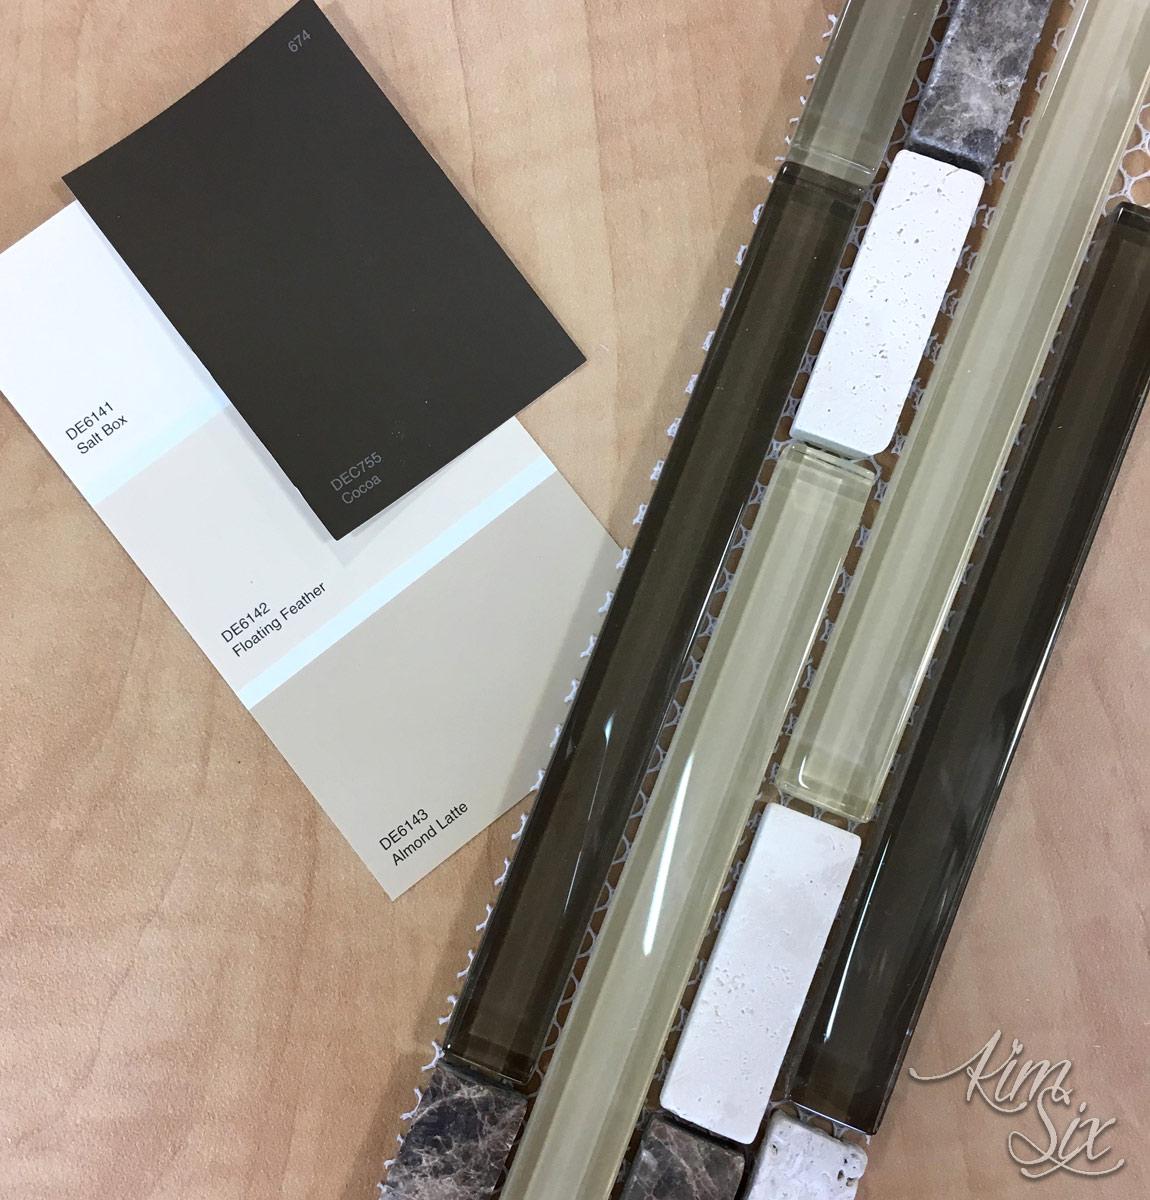 Matching paint color to pencil tile